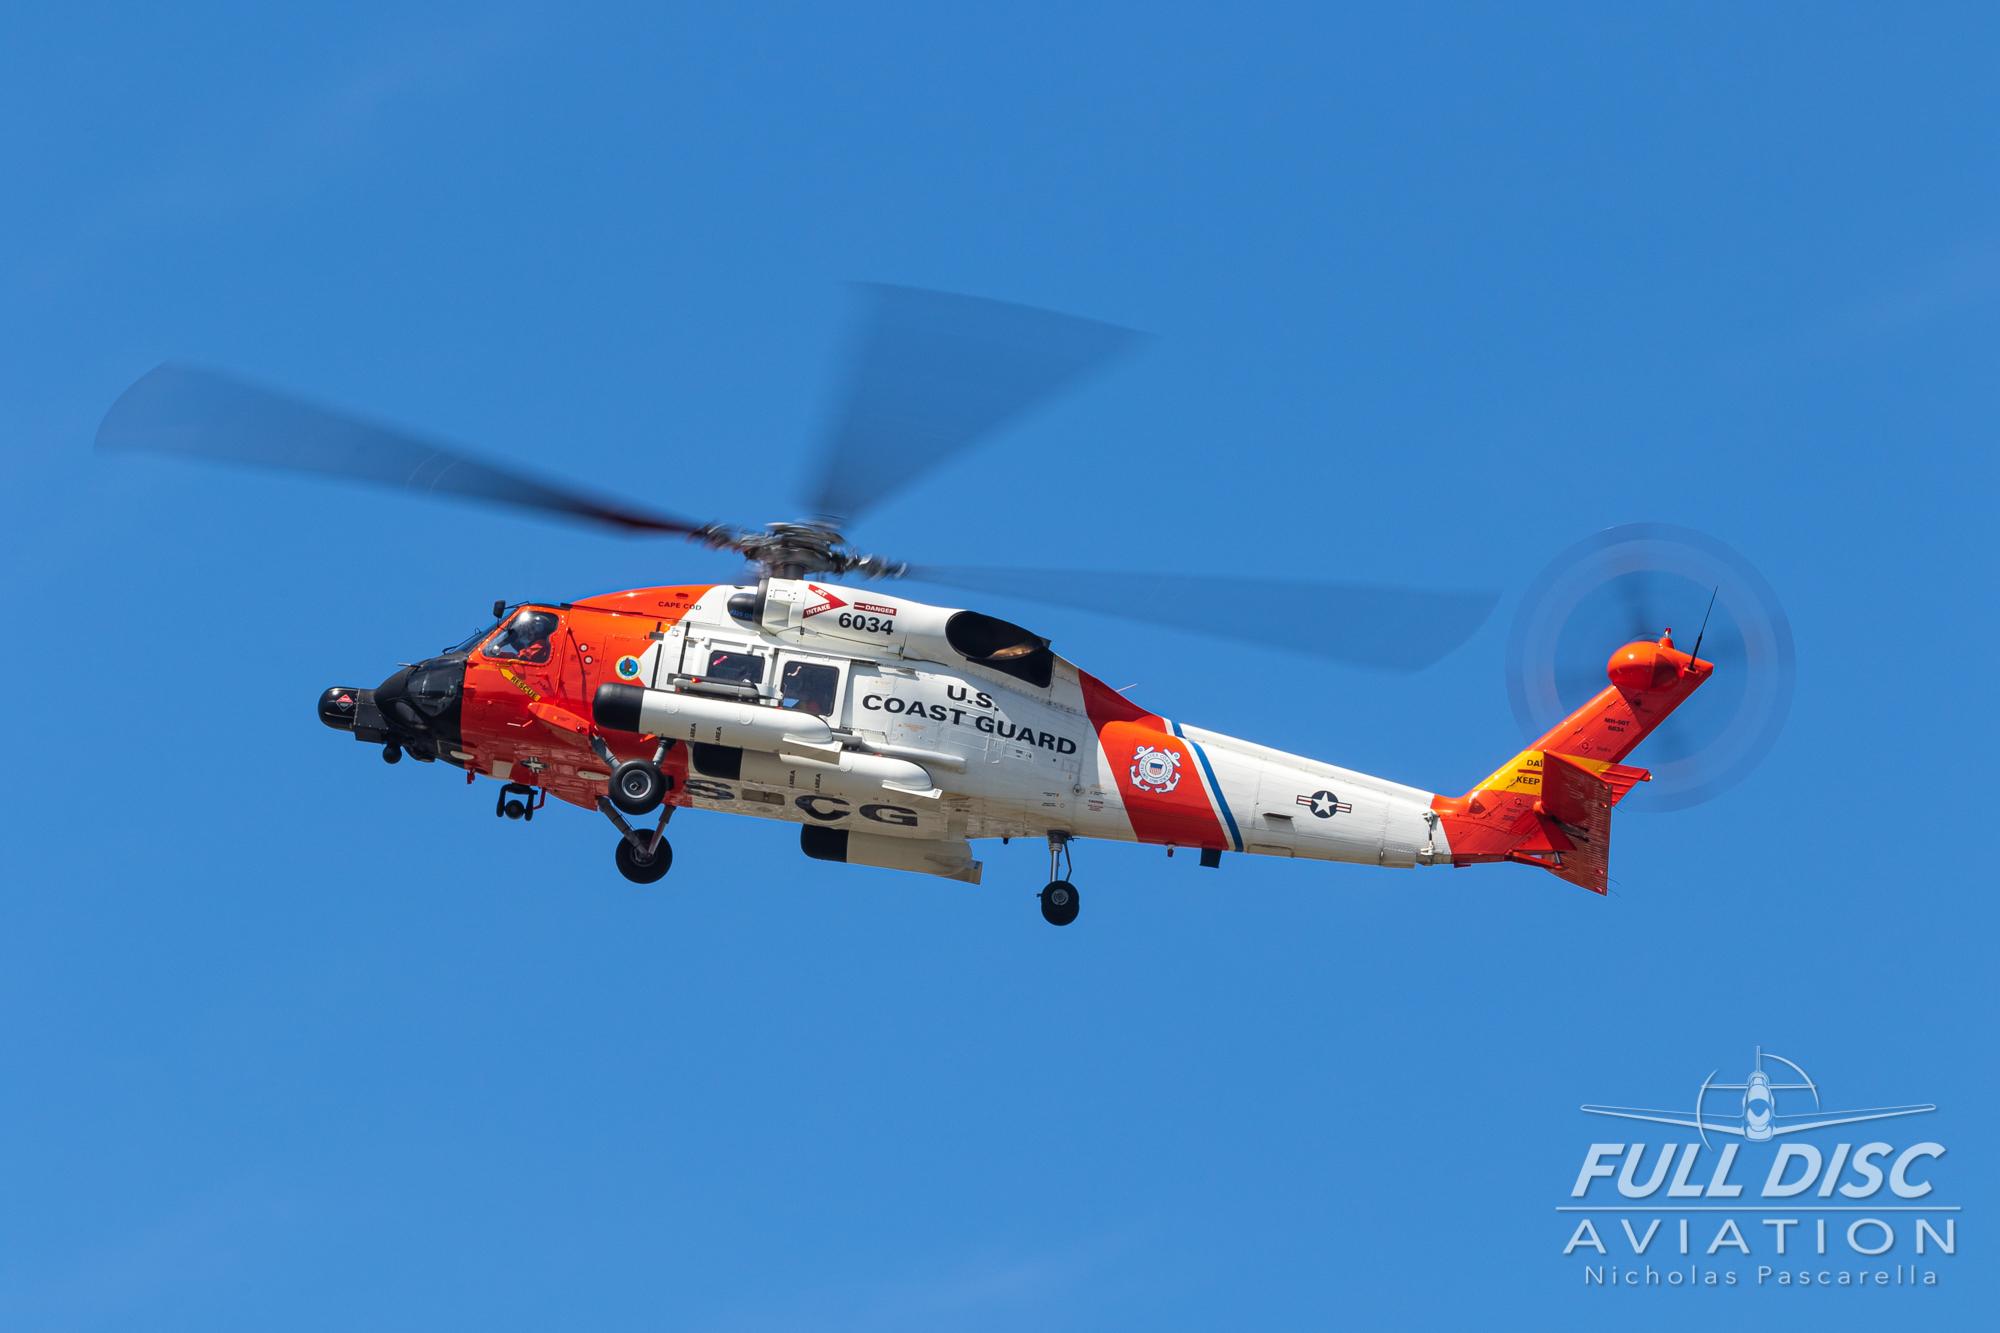 americanairpowermuseum_nicholaspascarella_nickpascarella_fulldiscaviation_legendsofairpower2019_aviation_warbird_coastguard_rescue_searchandrescue.jpg